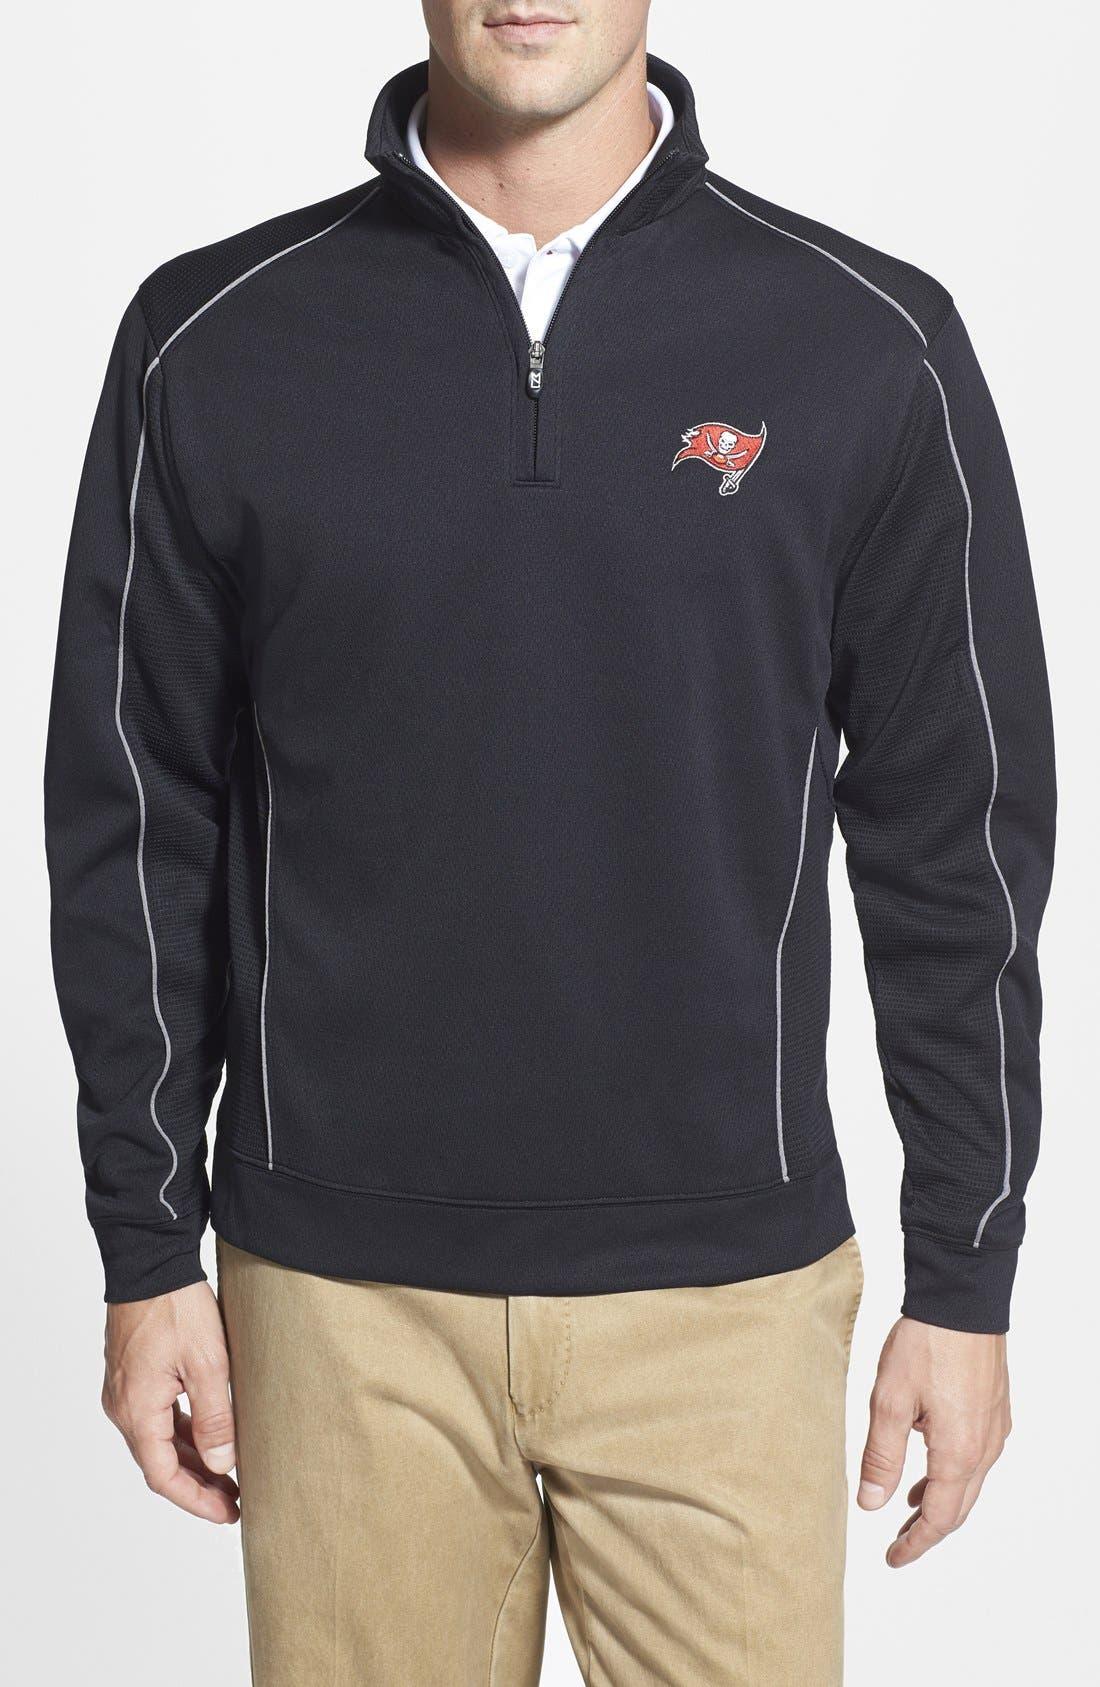 Tampa Bay Buccaneers - Edge DryTec Moisture Wicking Half Zip Pullover,                             Main thumbnail 1, color,